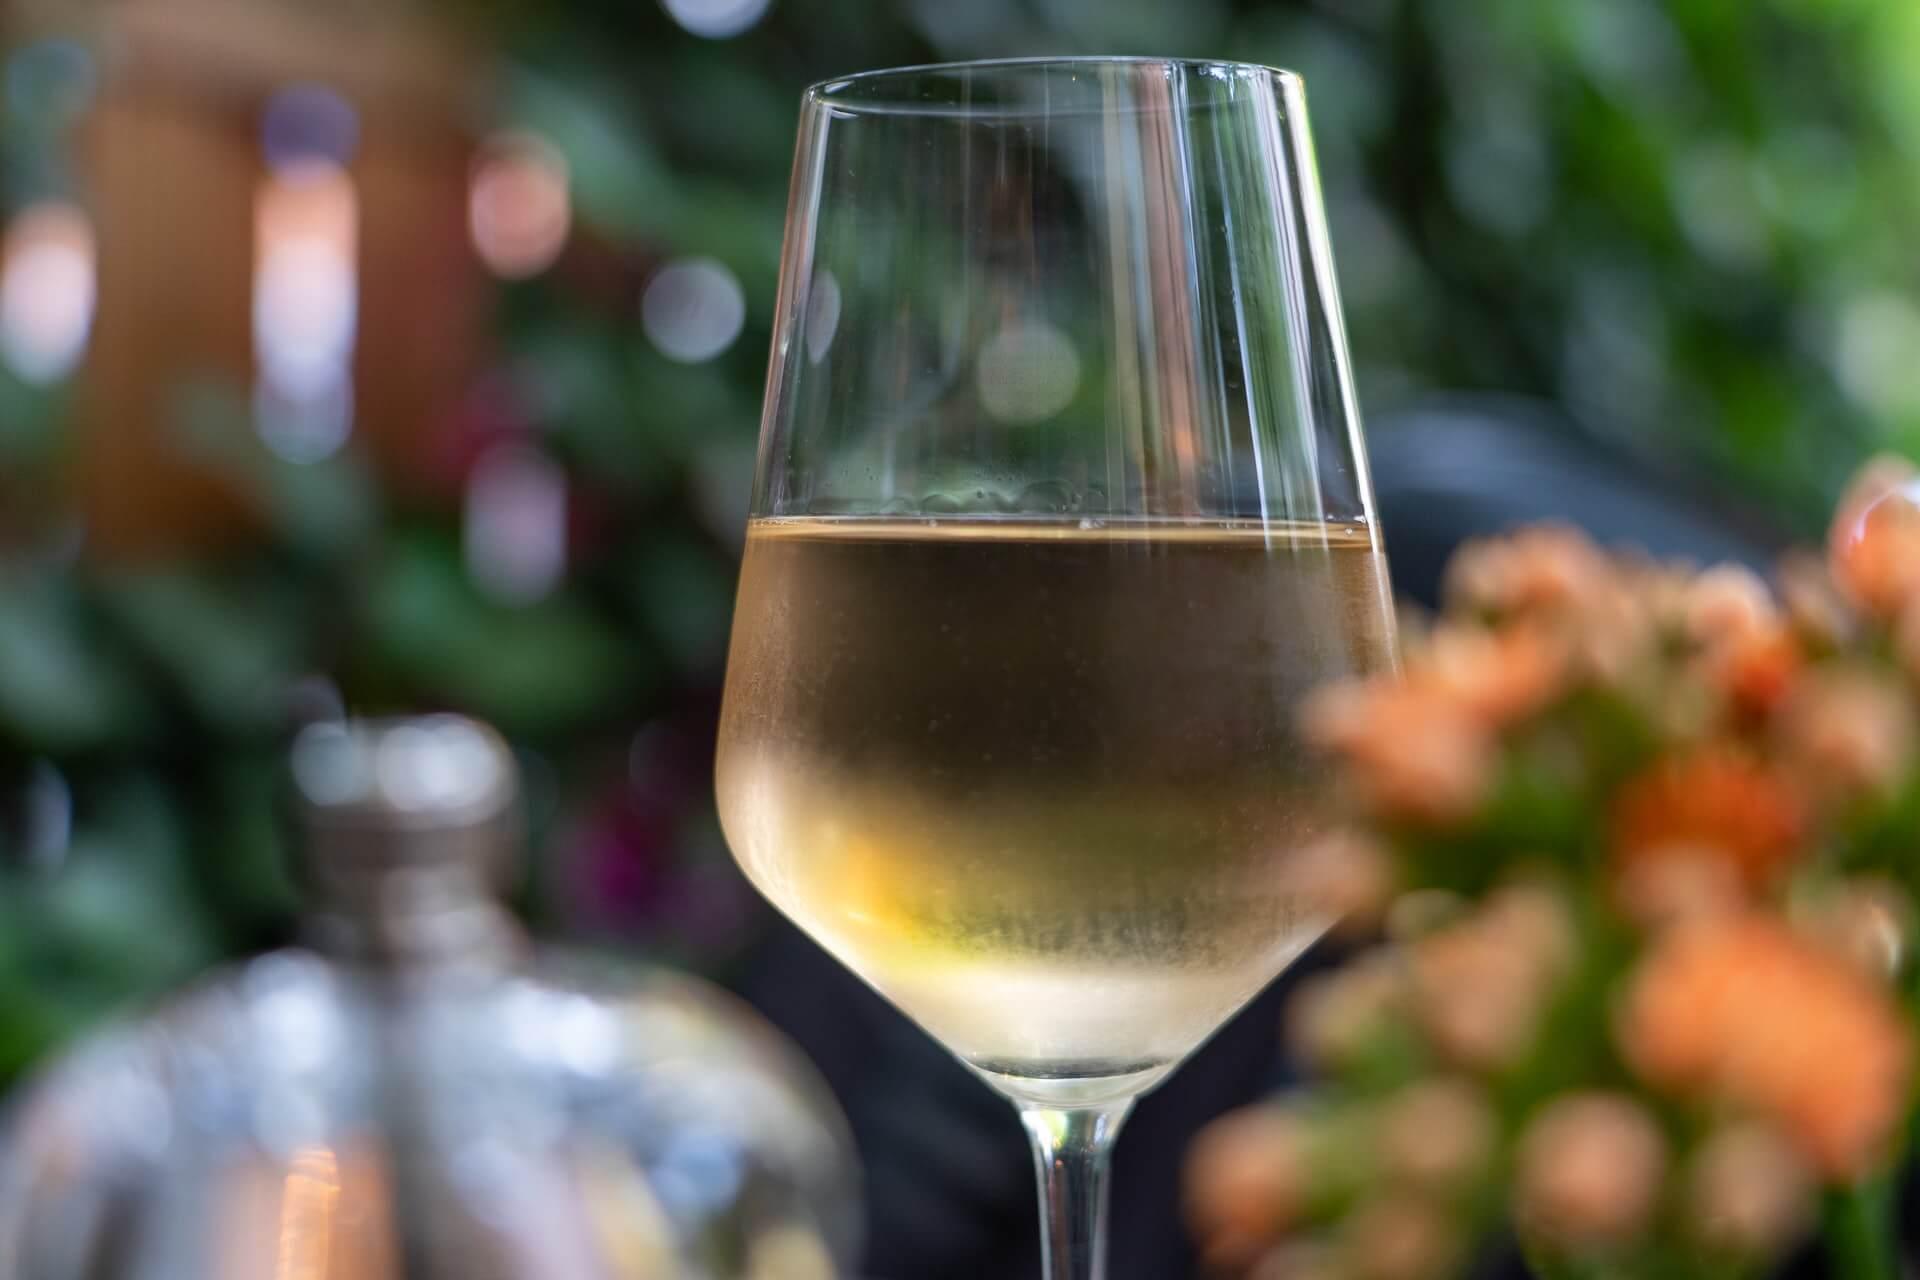 Vrhunska dalmatinska vina